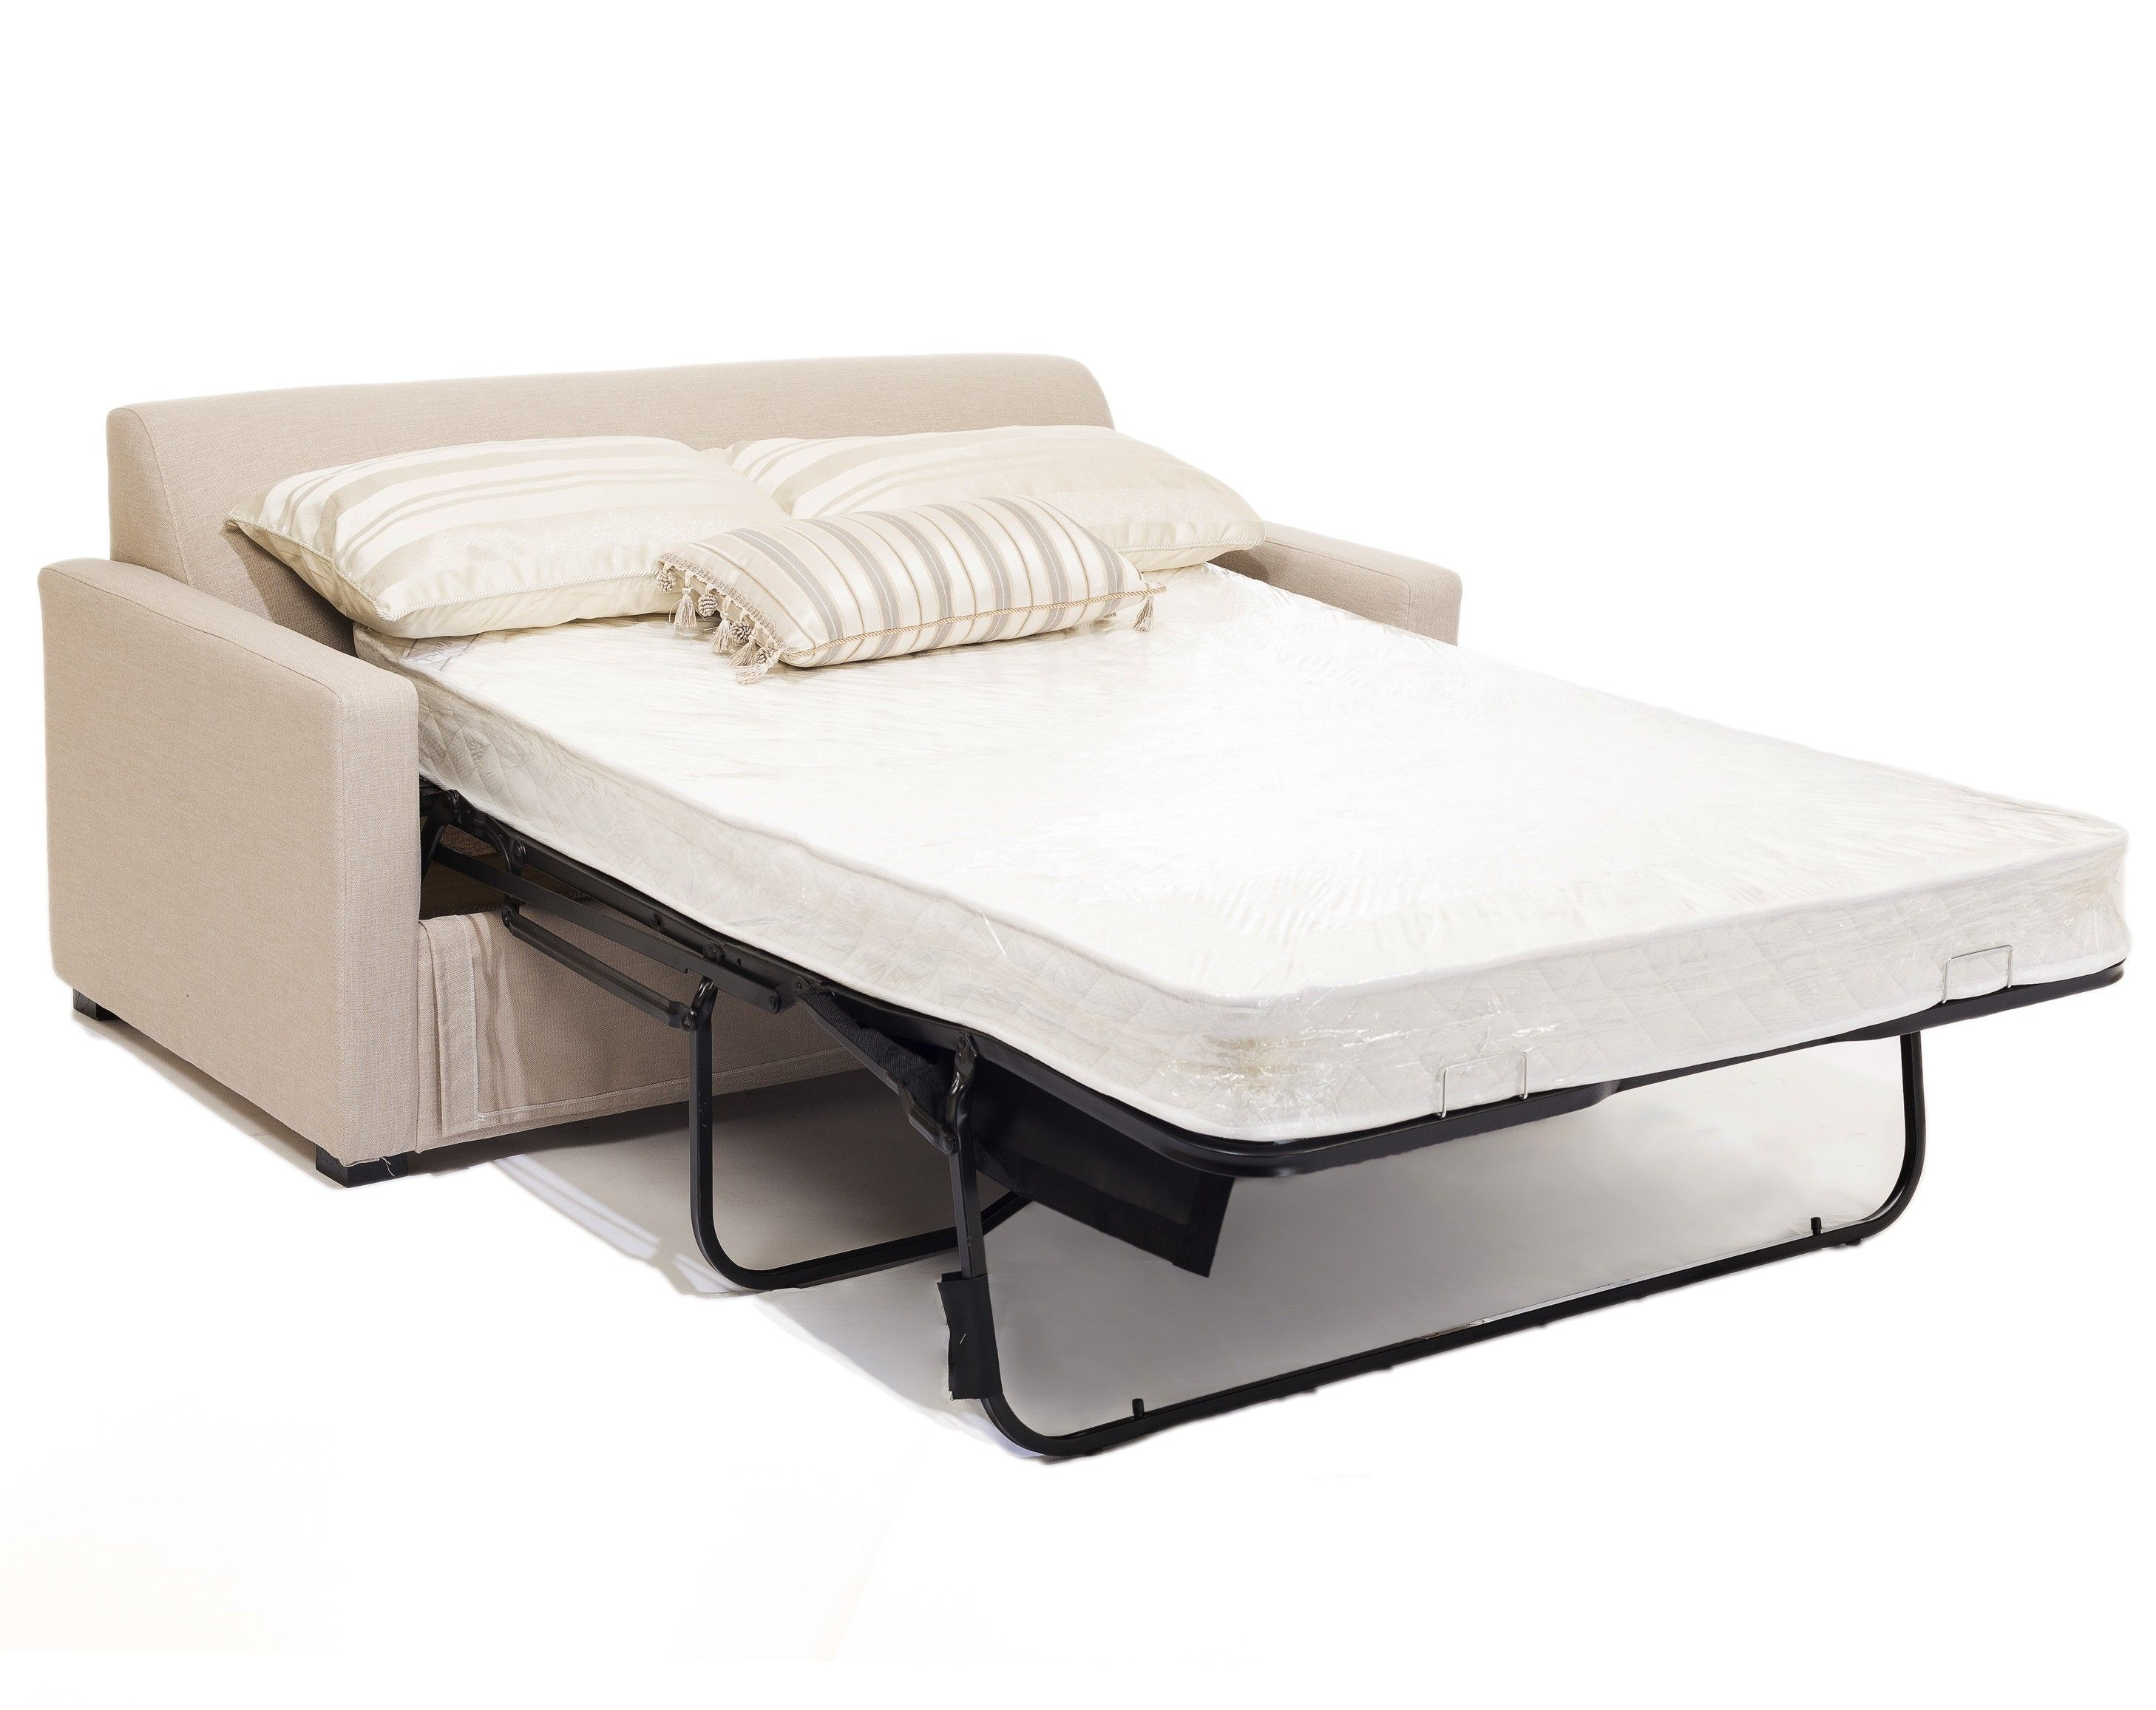 double sofa bed mattress cheap sets online fold out foam guest z